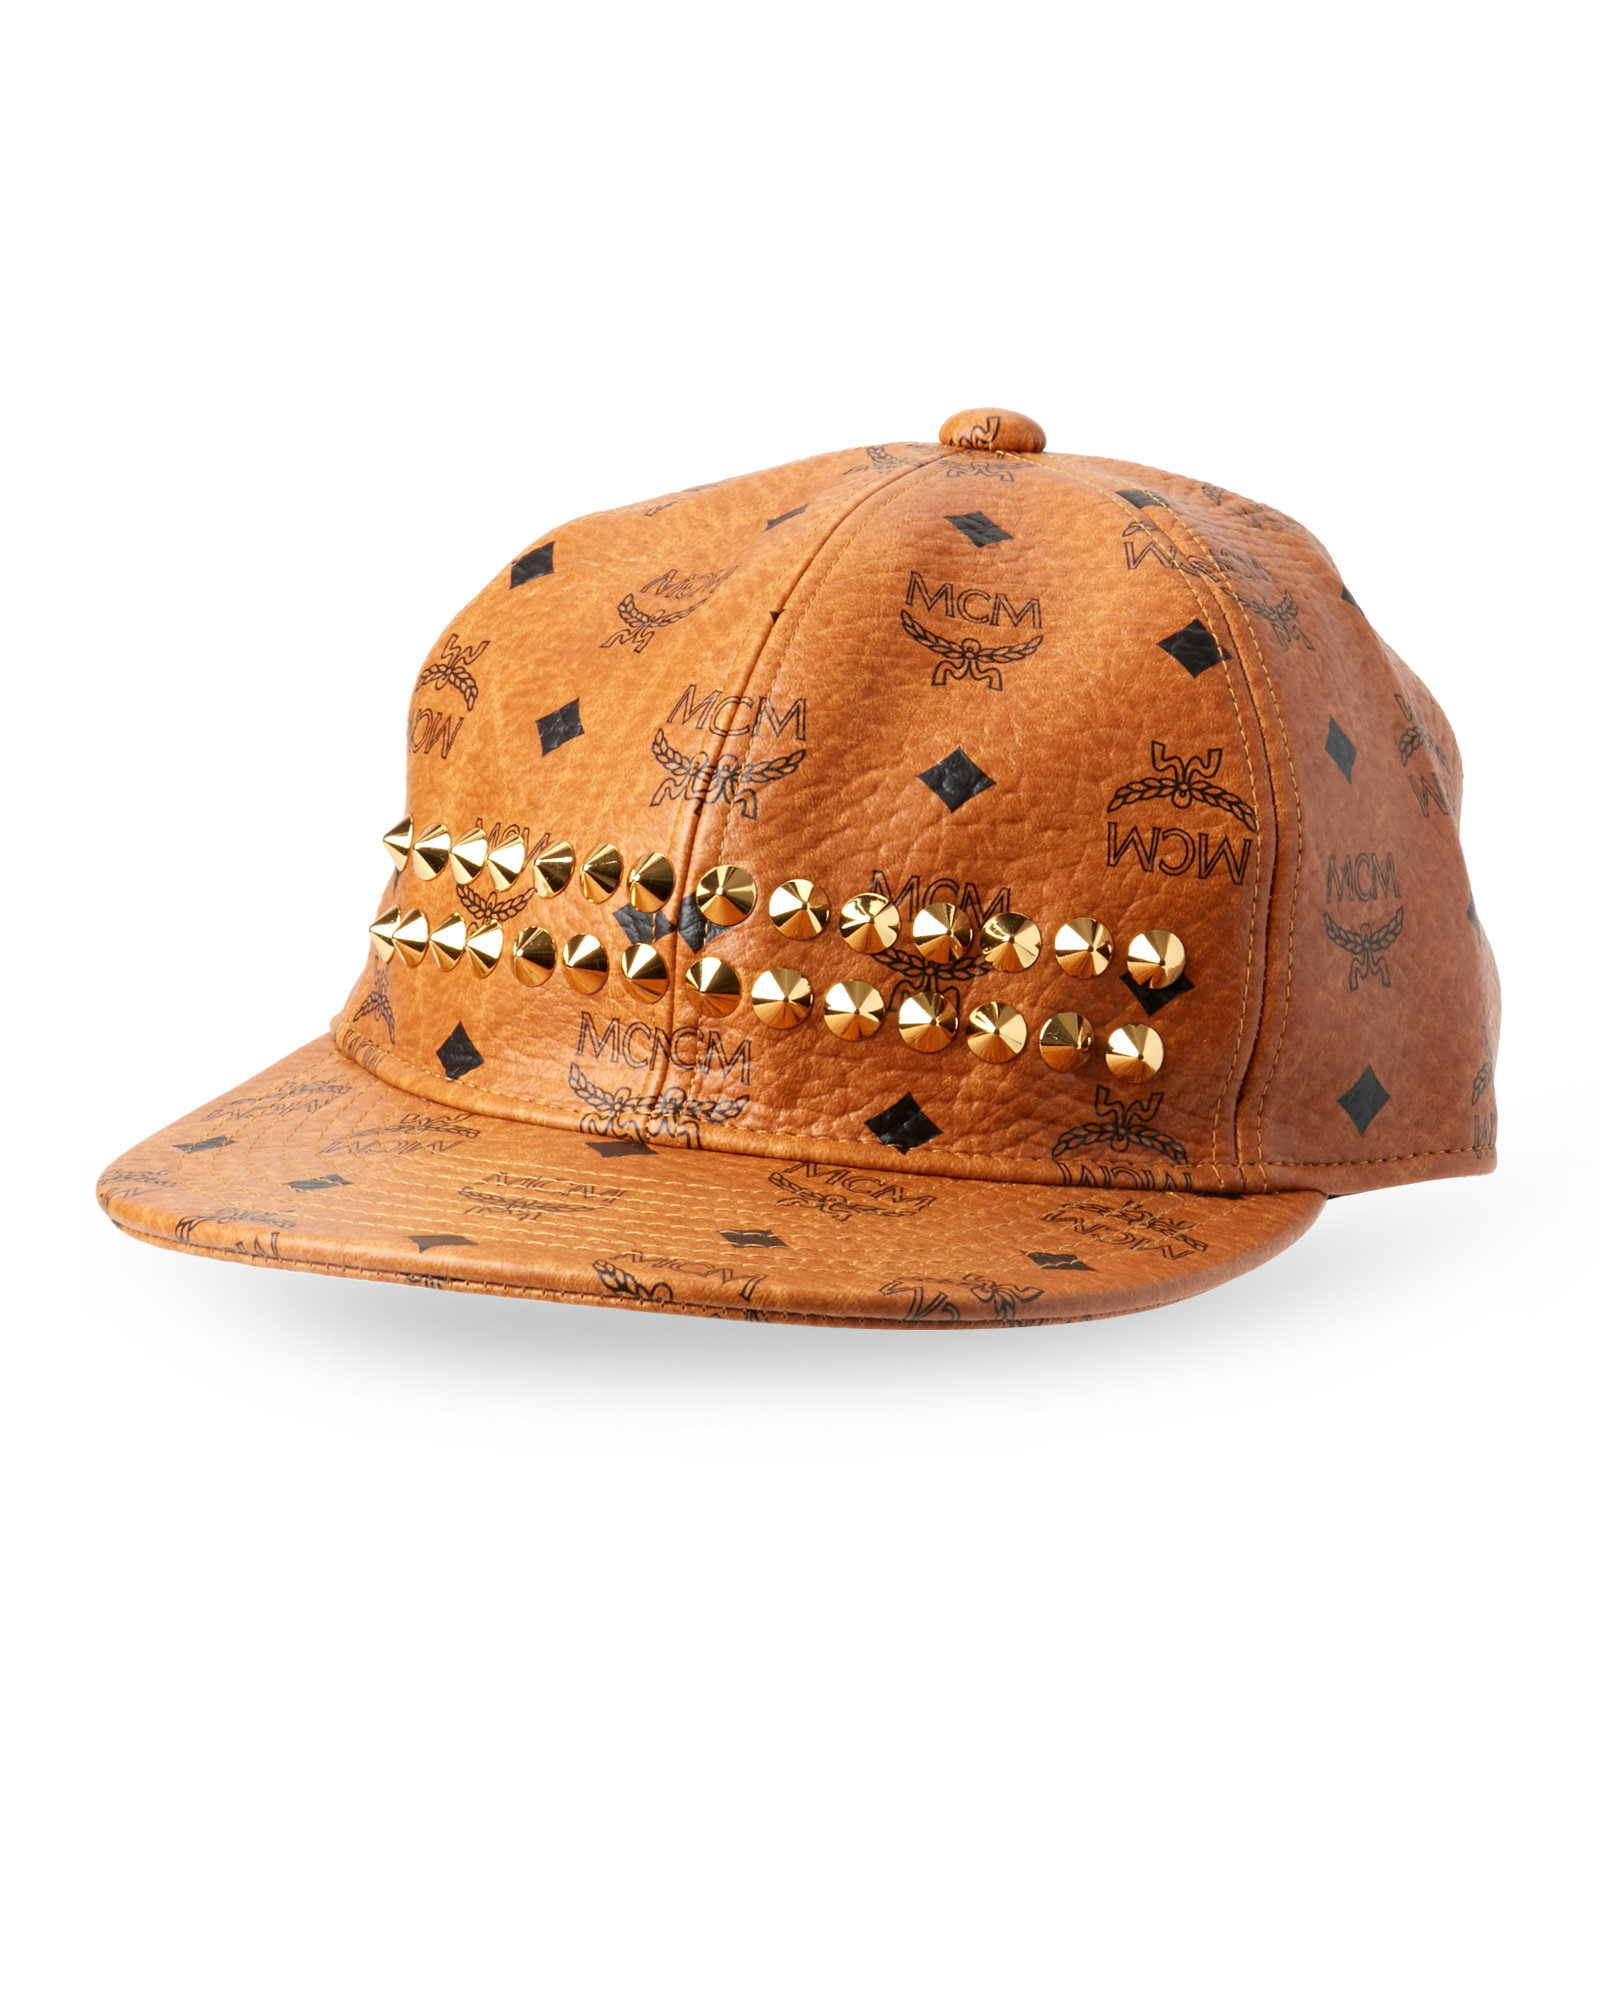 ... norway lyst mcm cognac studded stark cap in brown 0ddff 486c6 ... a2f3f853359e